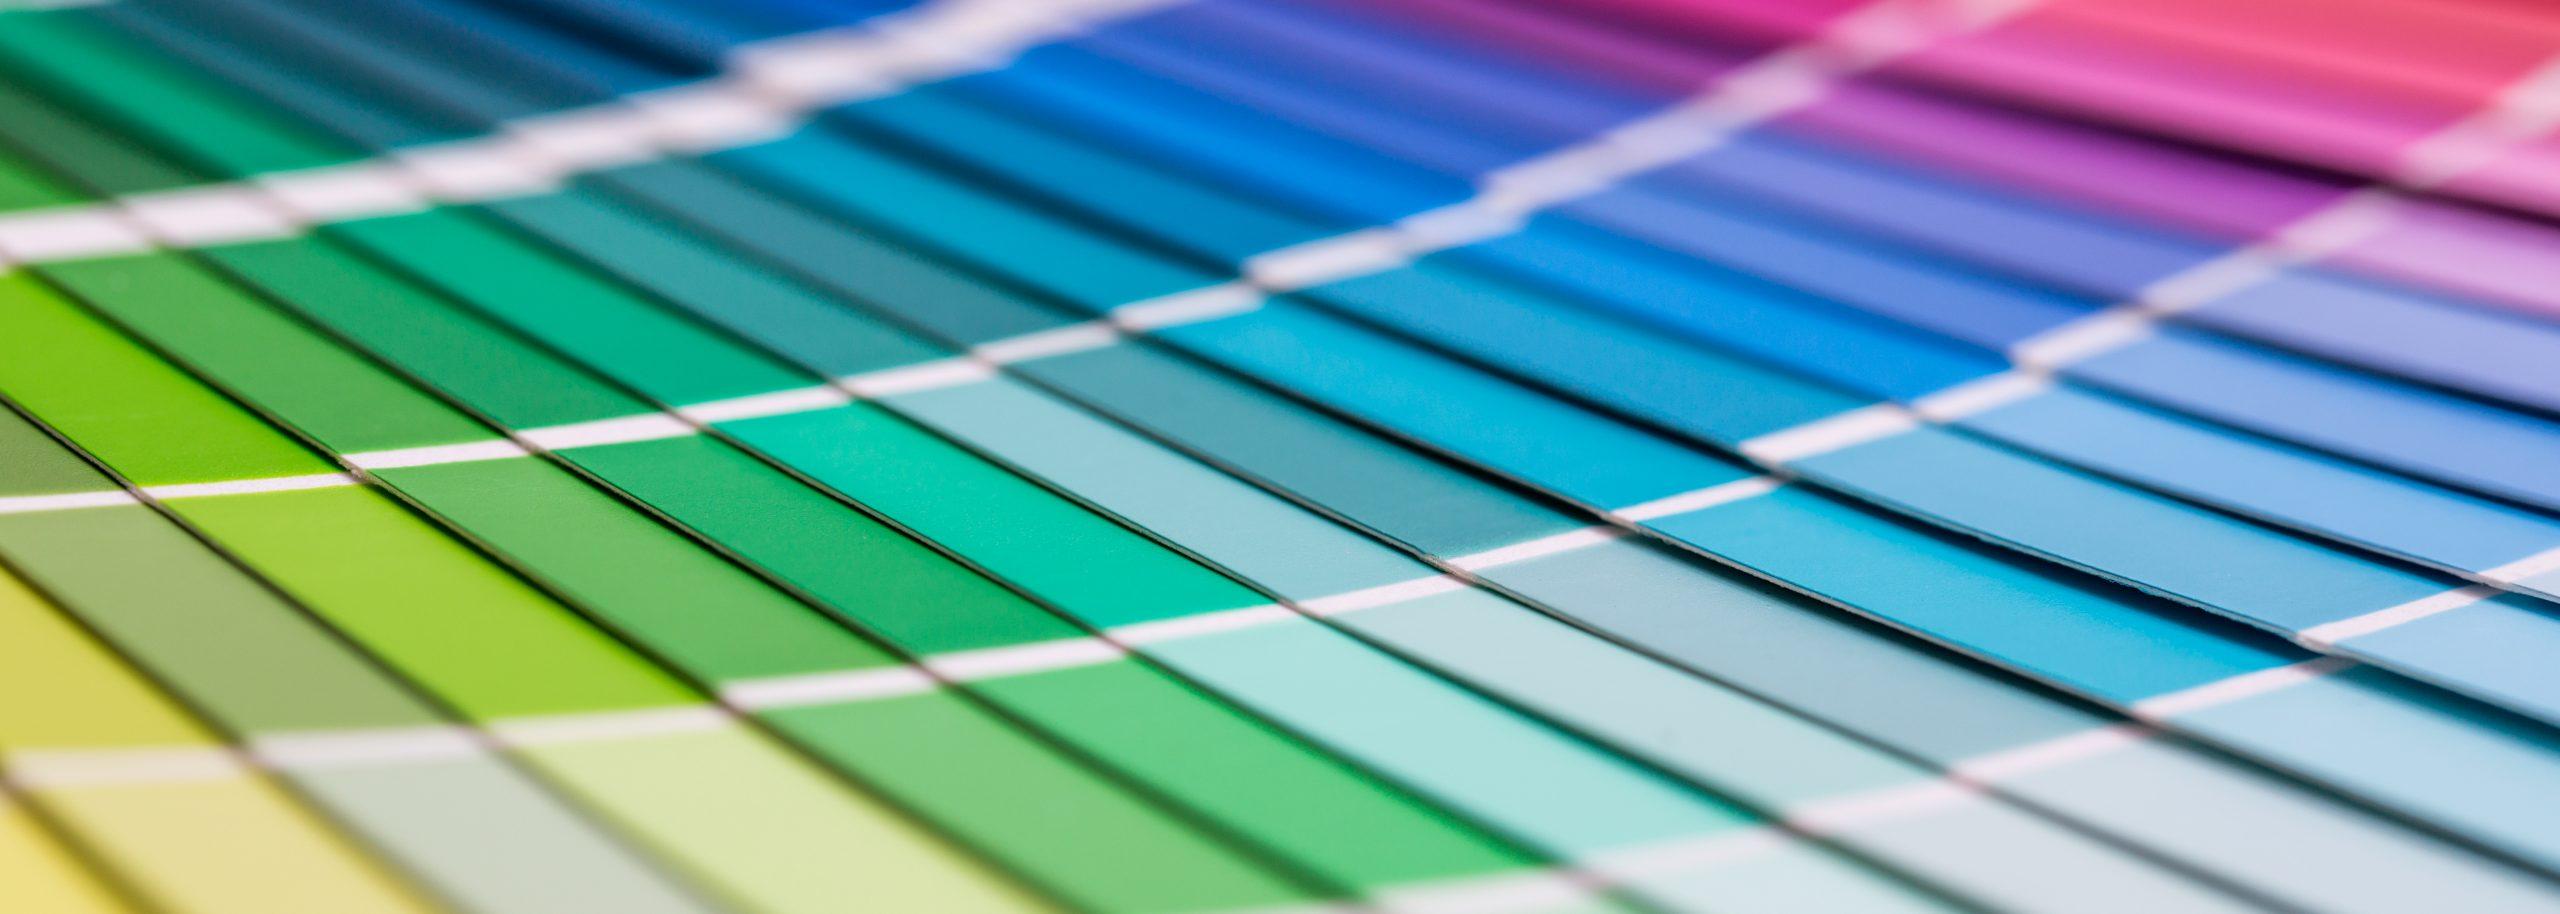 Documents (Decorative coating)